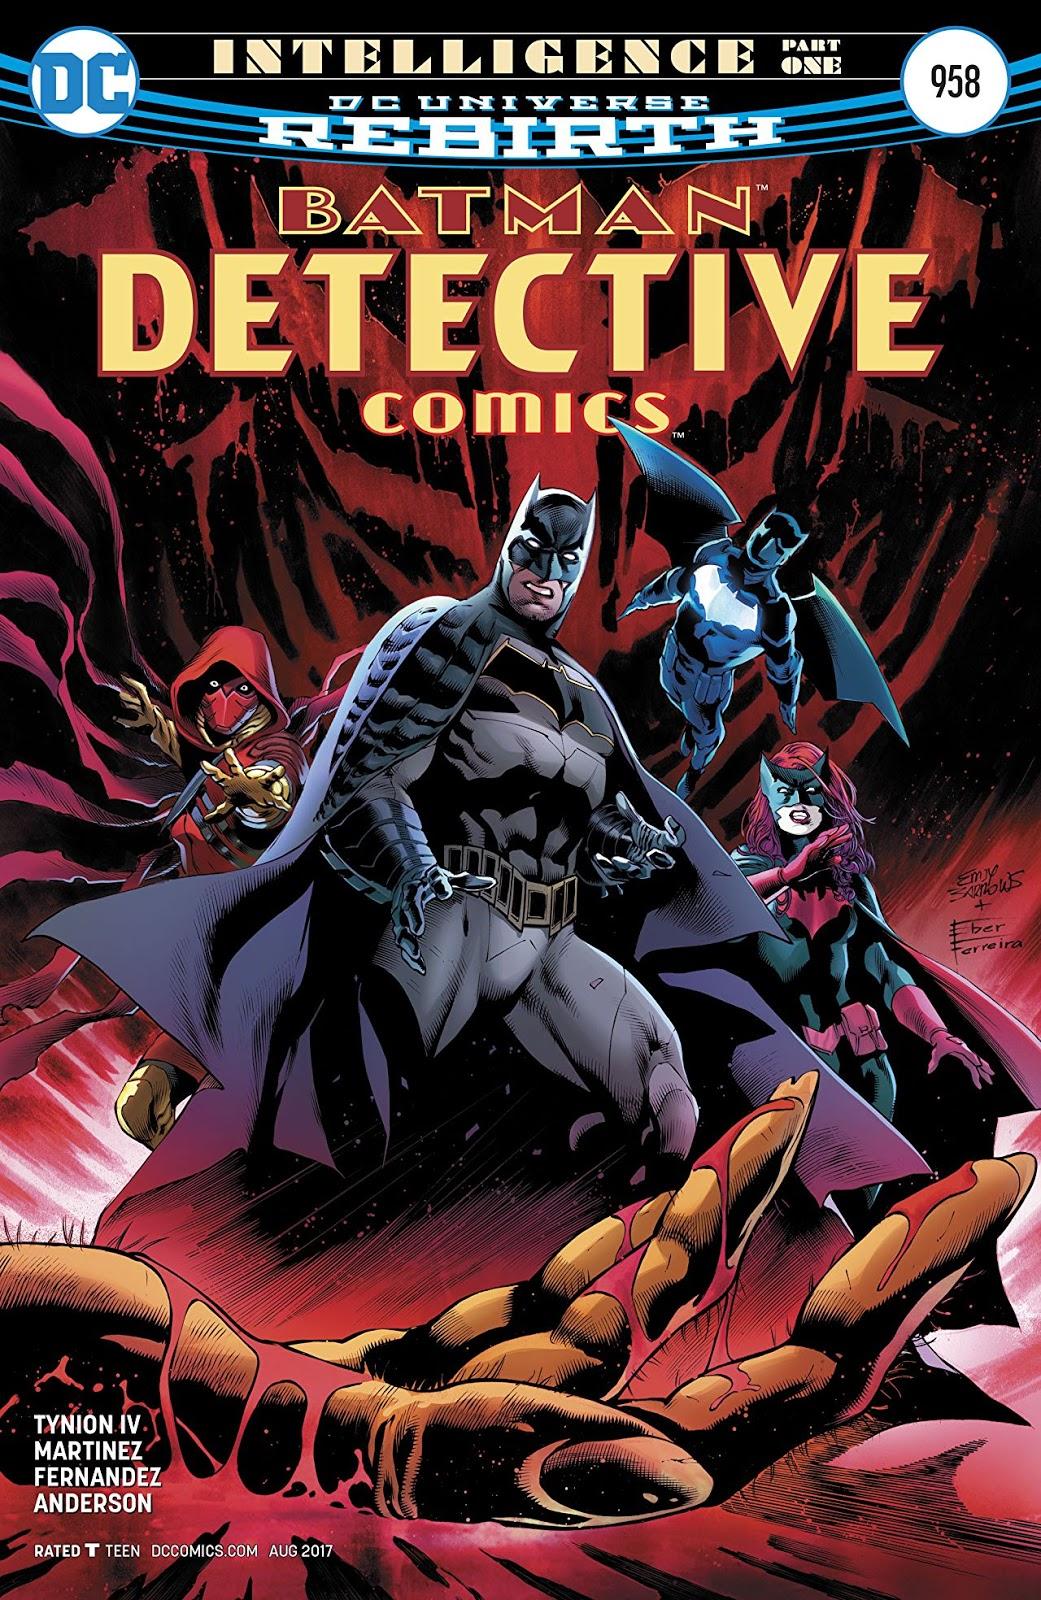 Action Comics 981 2017 Webrip The Last Kryptonian Dcp Cbr Size 29 1 Mb S6 Postimg Org 6tcnhnush Action_comics_981_2017_webrip_the_last_kryp